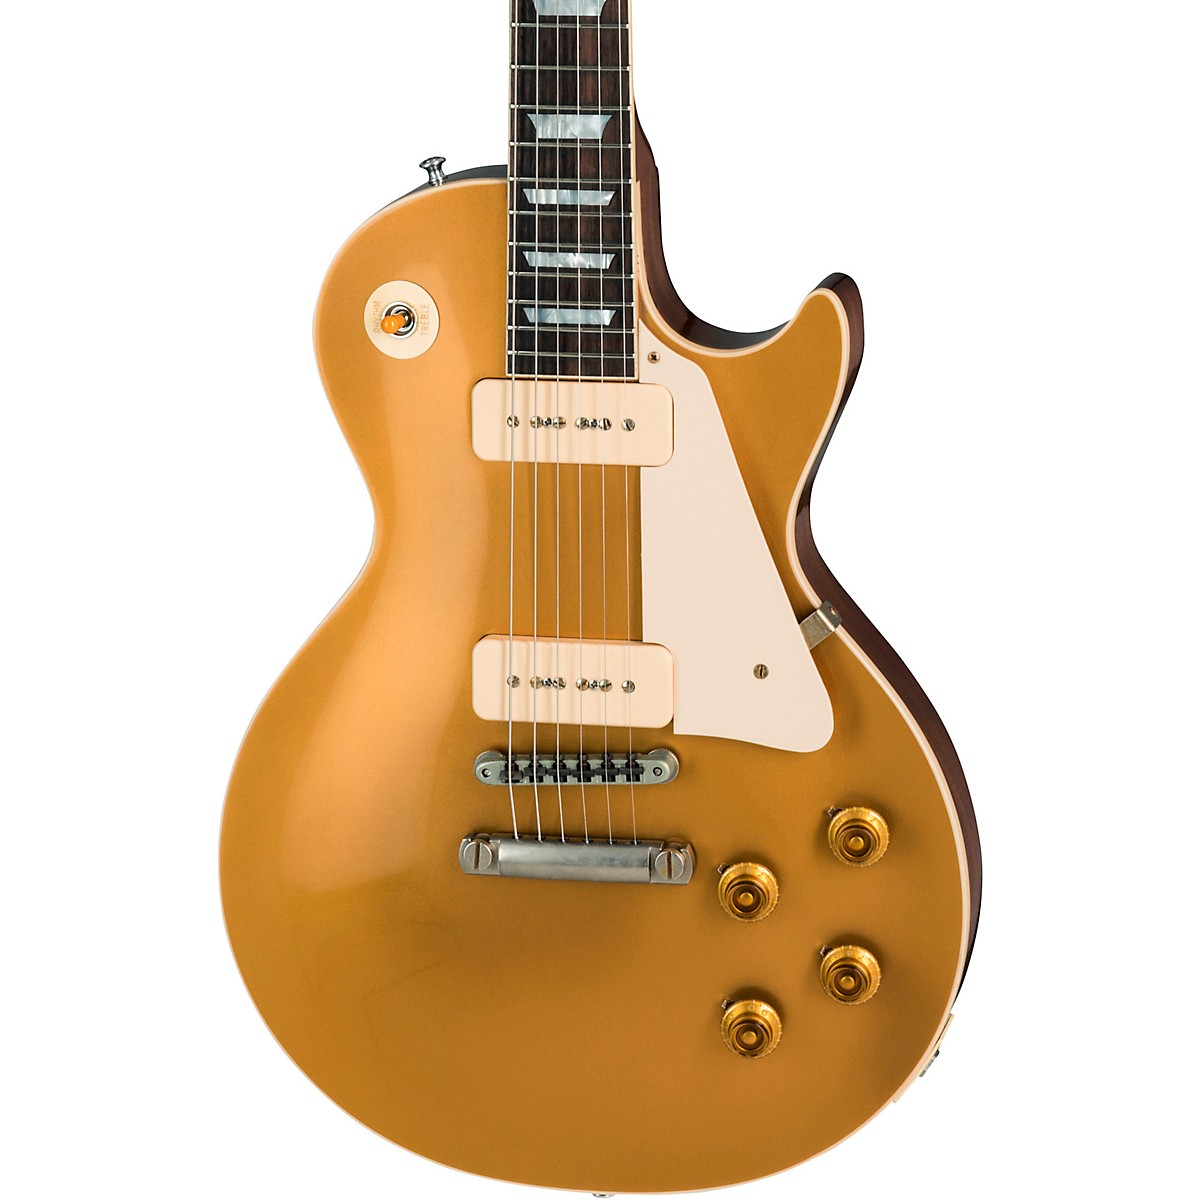 Gibson Custom Historic '56 Les Paul VOS Electric Guitar